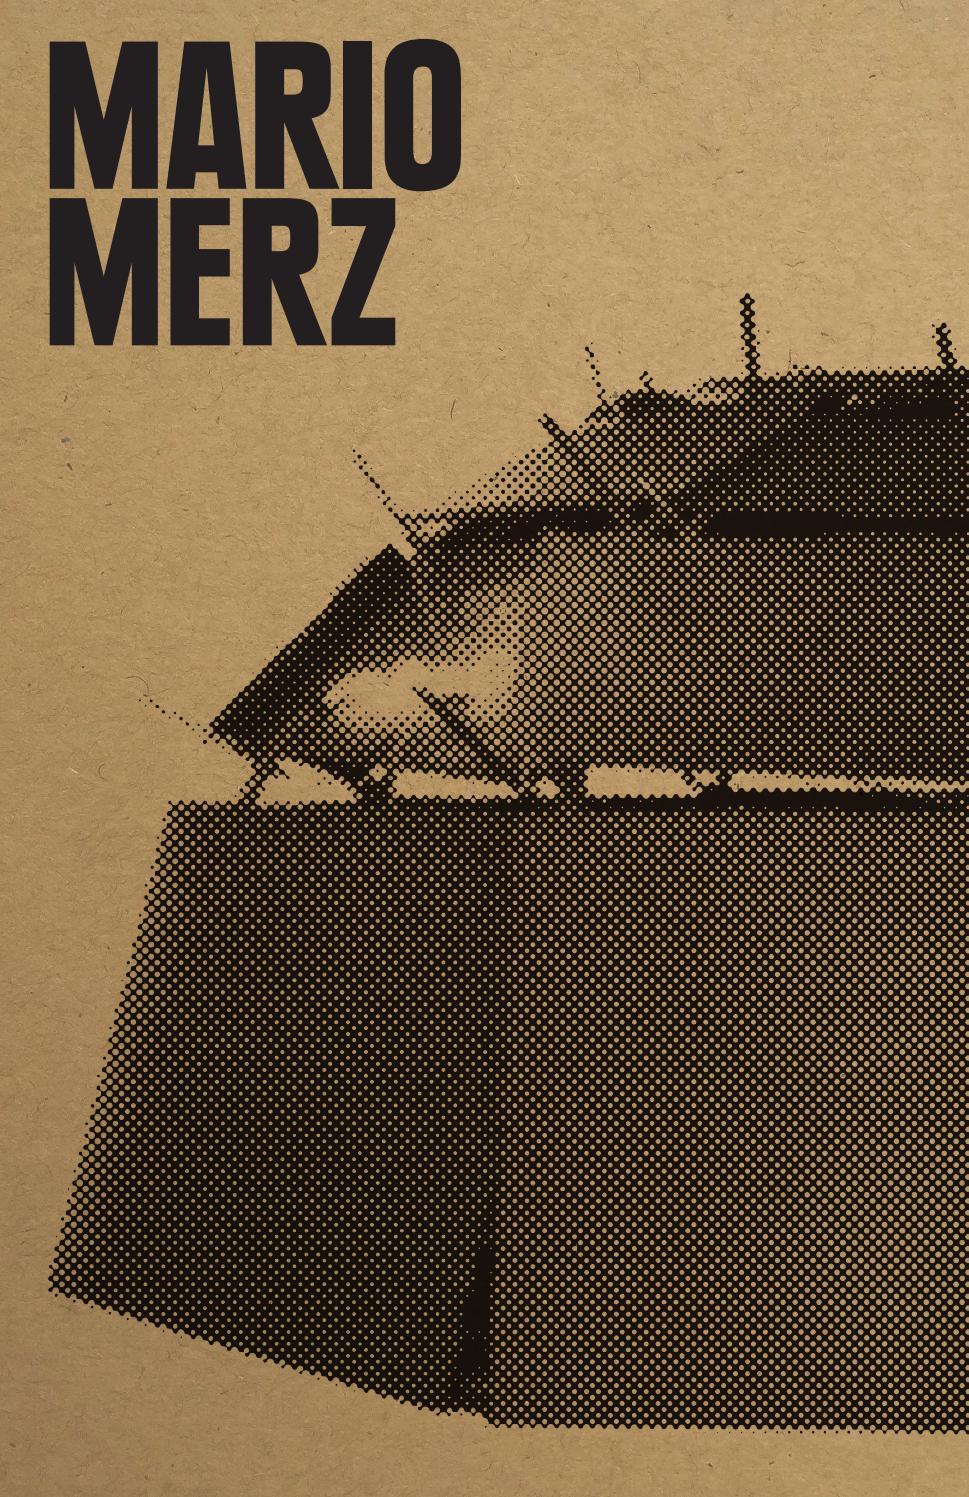 year 2006 GIORGIO DE CHIRICO Nobles and bourgeois Original vintage poster